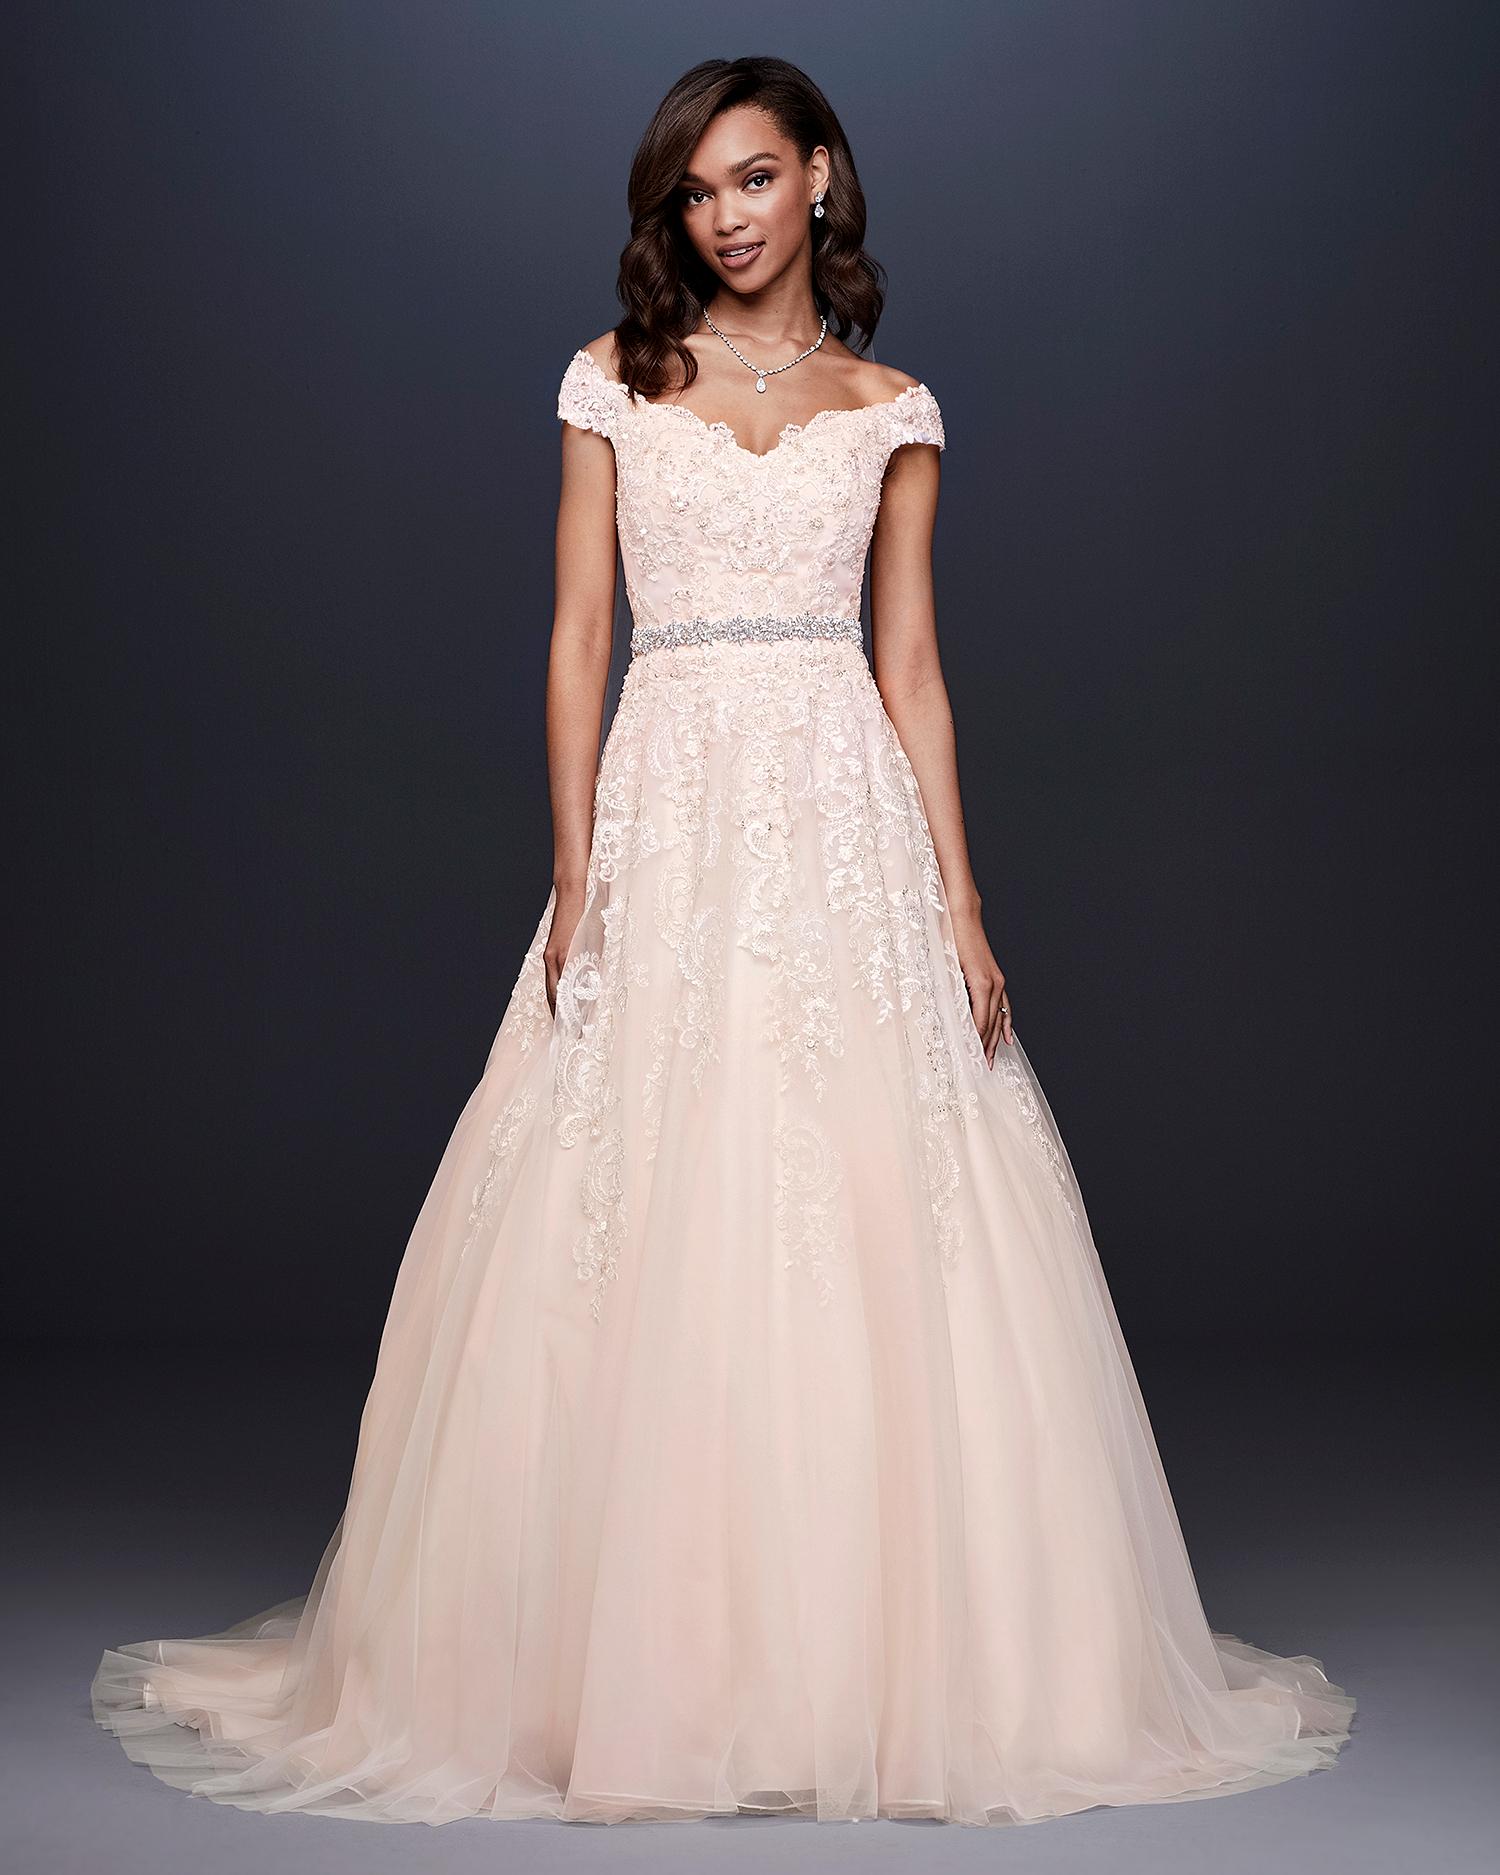 davids bridal wedding dress fall 2019 blush a-line with cap sleeves